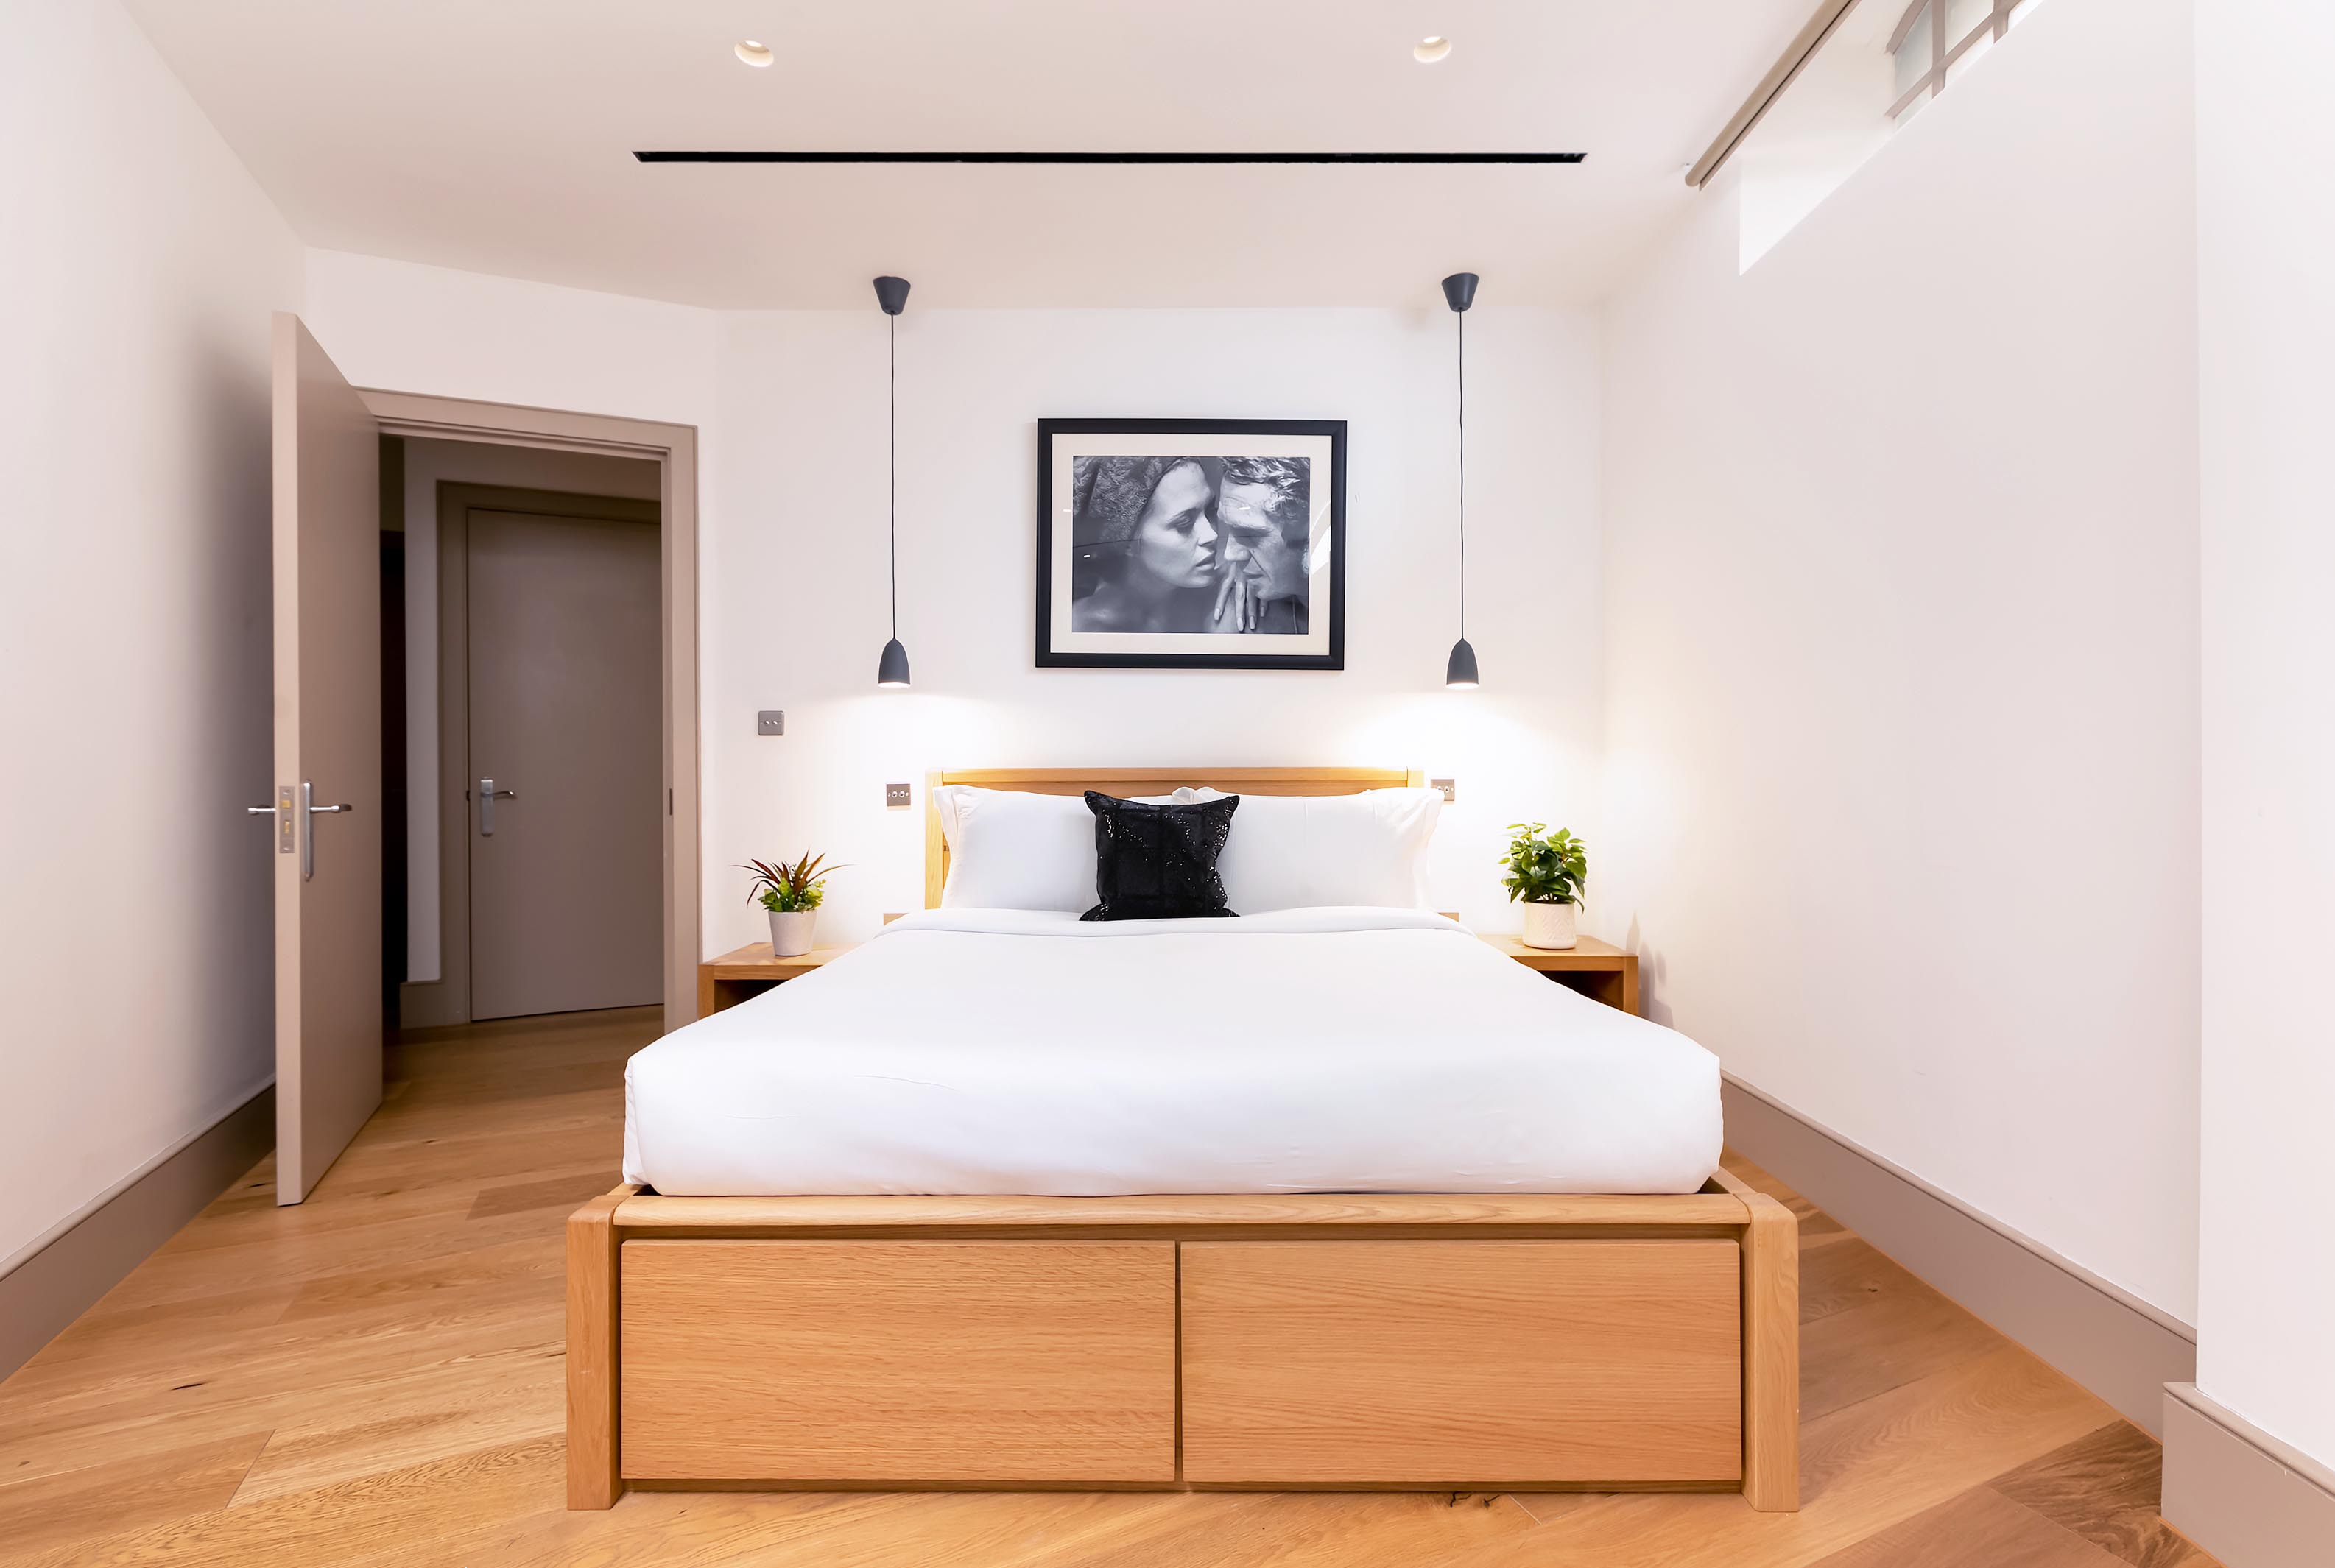 Lovelydays luxury service apartment rental - London - Fitzrovia - Wells Mews B - Lovelysuite - 2 bedrooms - 2 bathrooms - Double bed - bdf20f5f54ef - Lovelydays